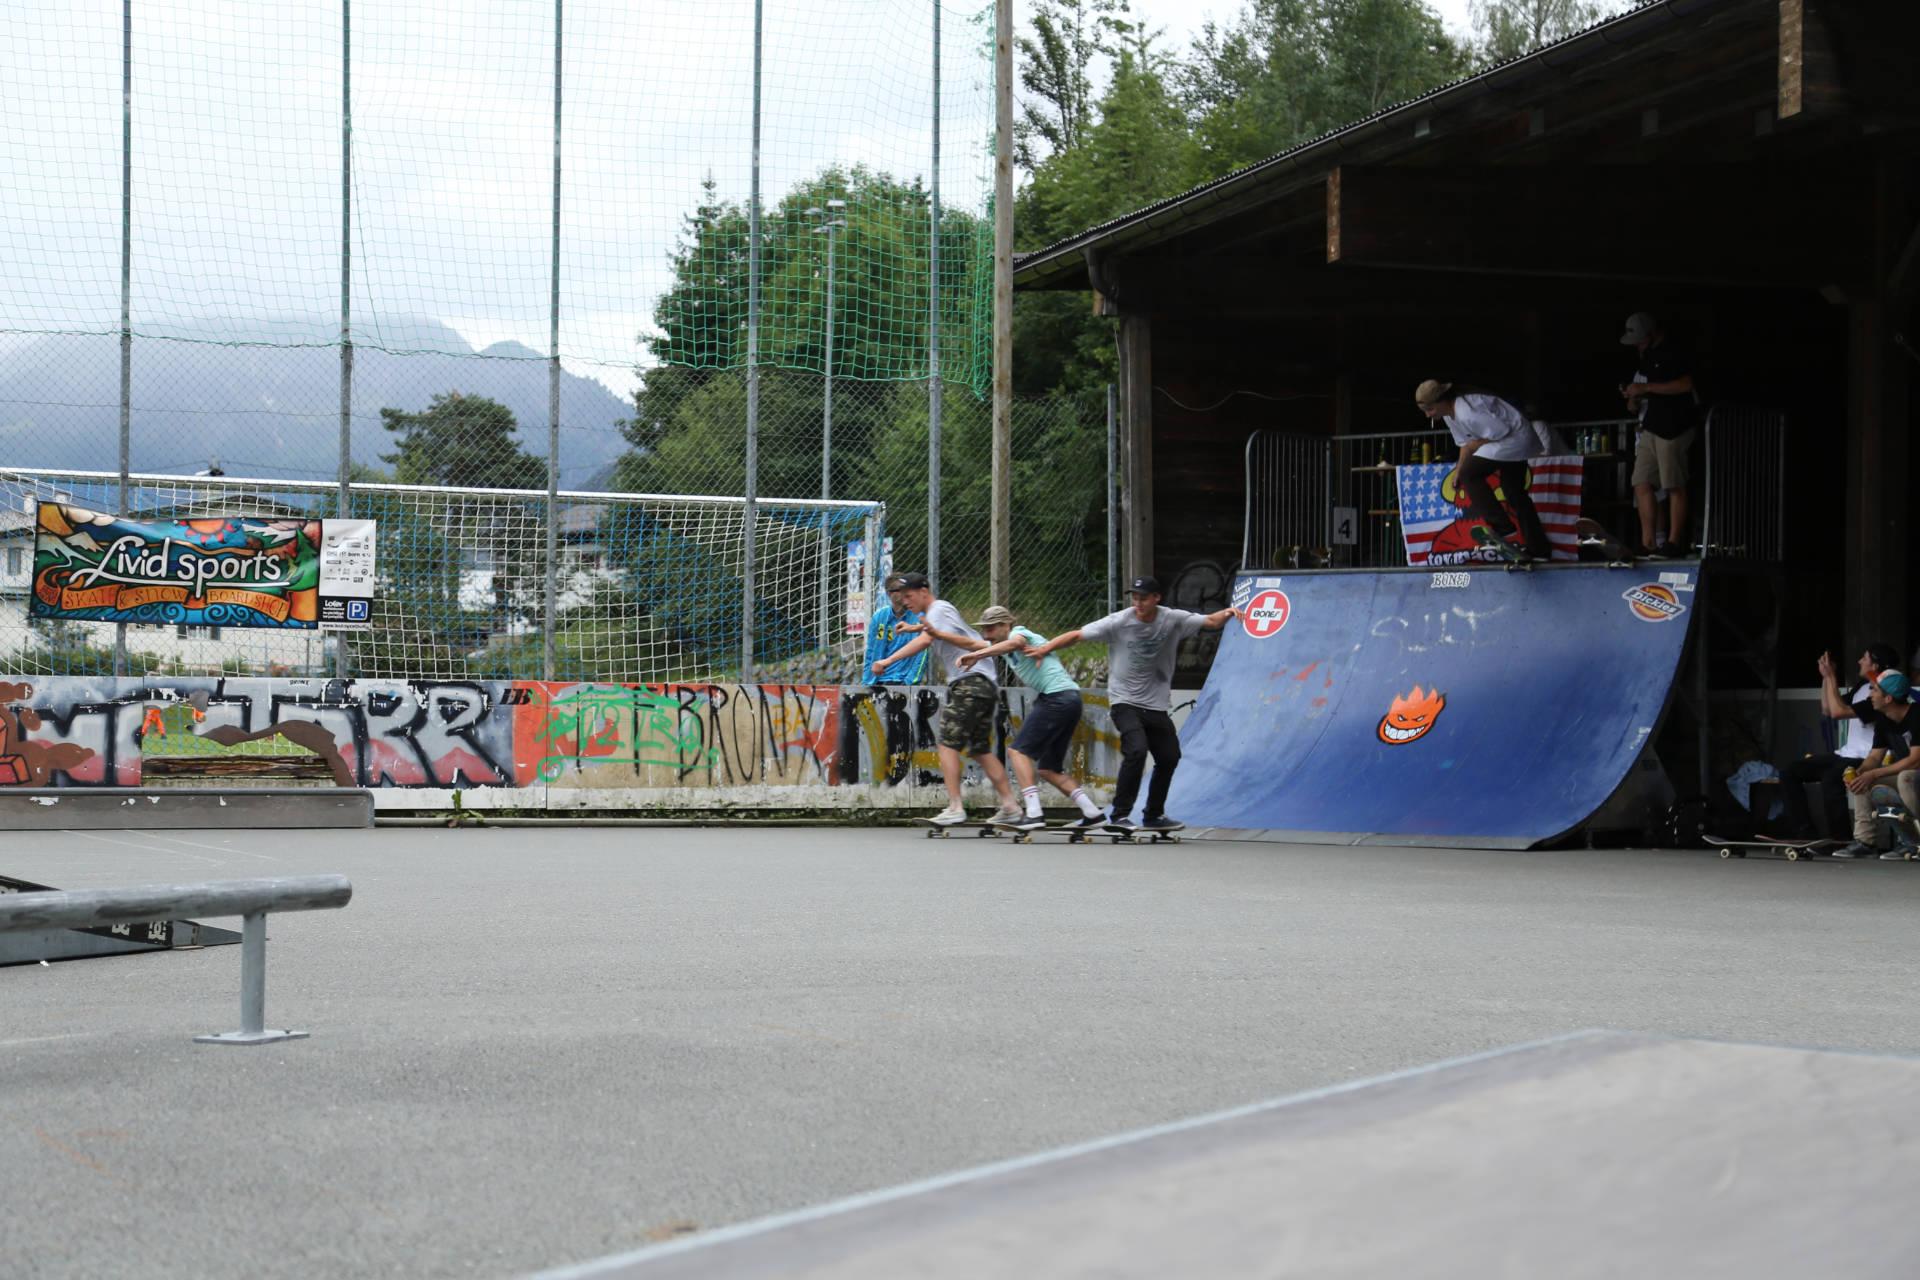 skateboardheadz fieberbrunn kgt 2019 finale 00127